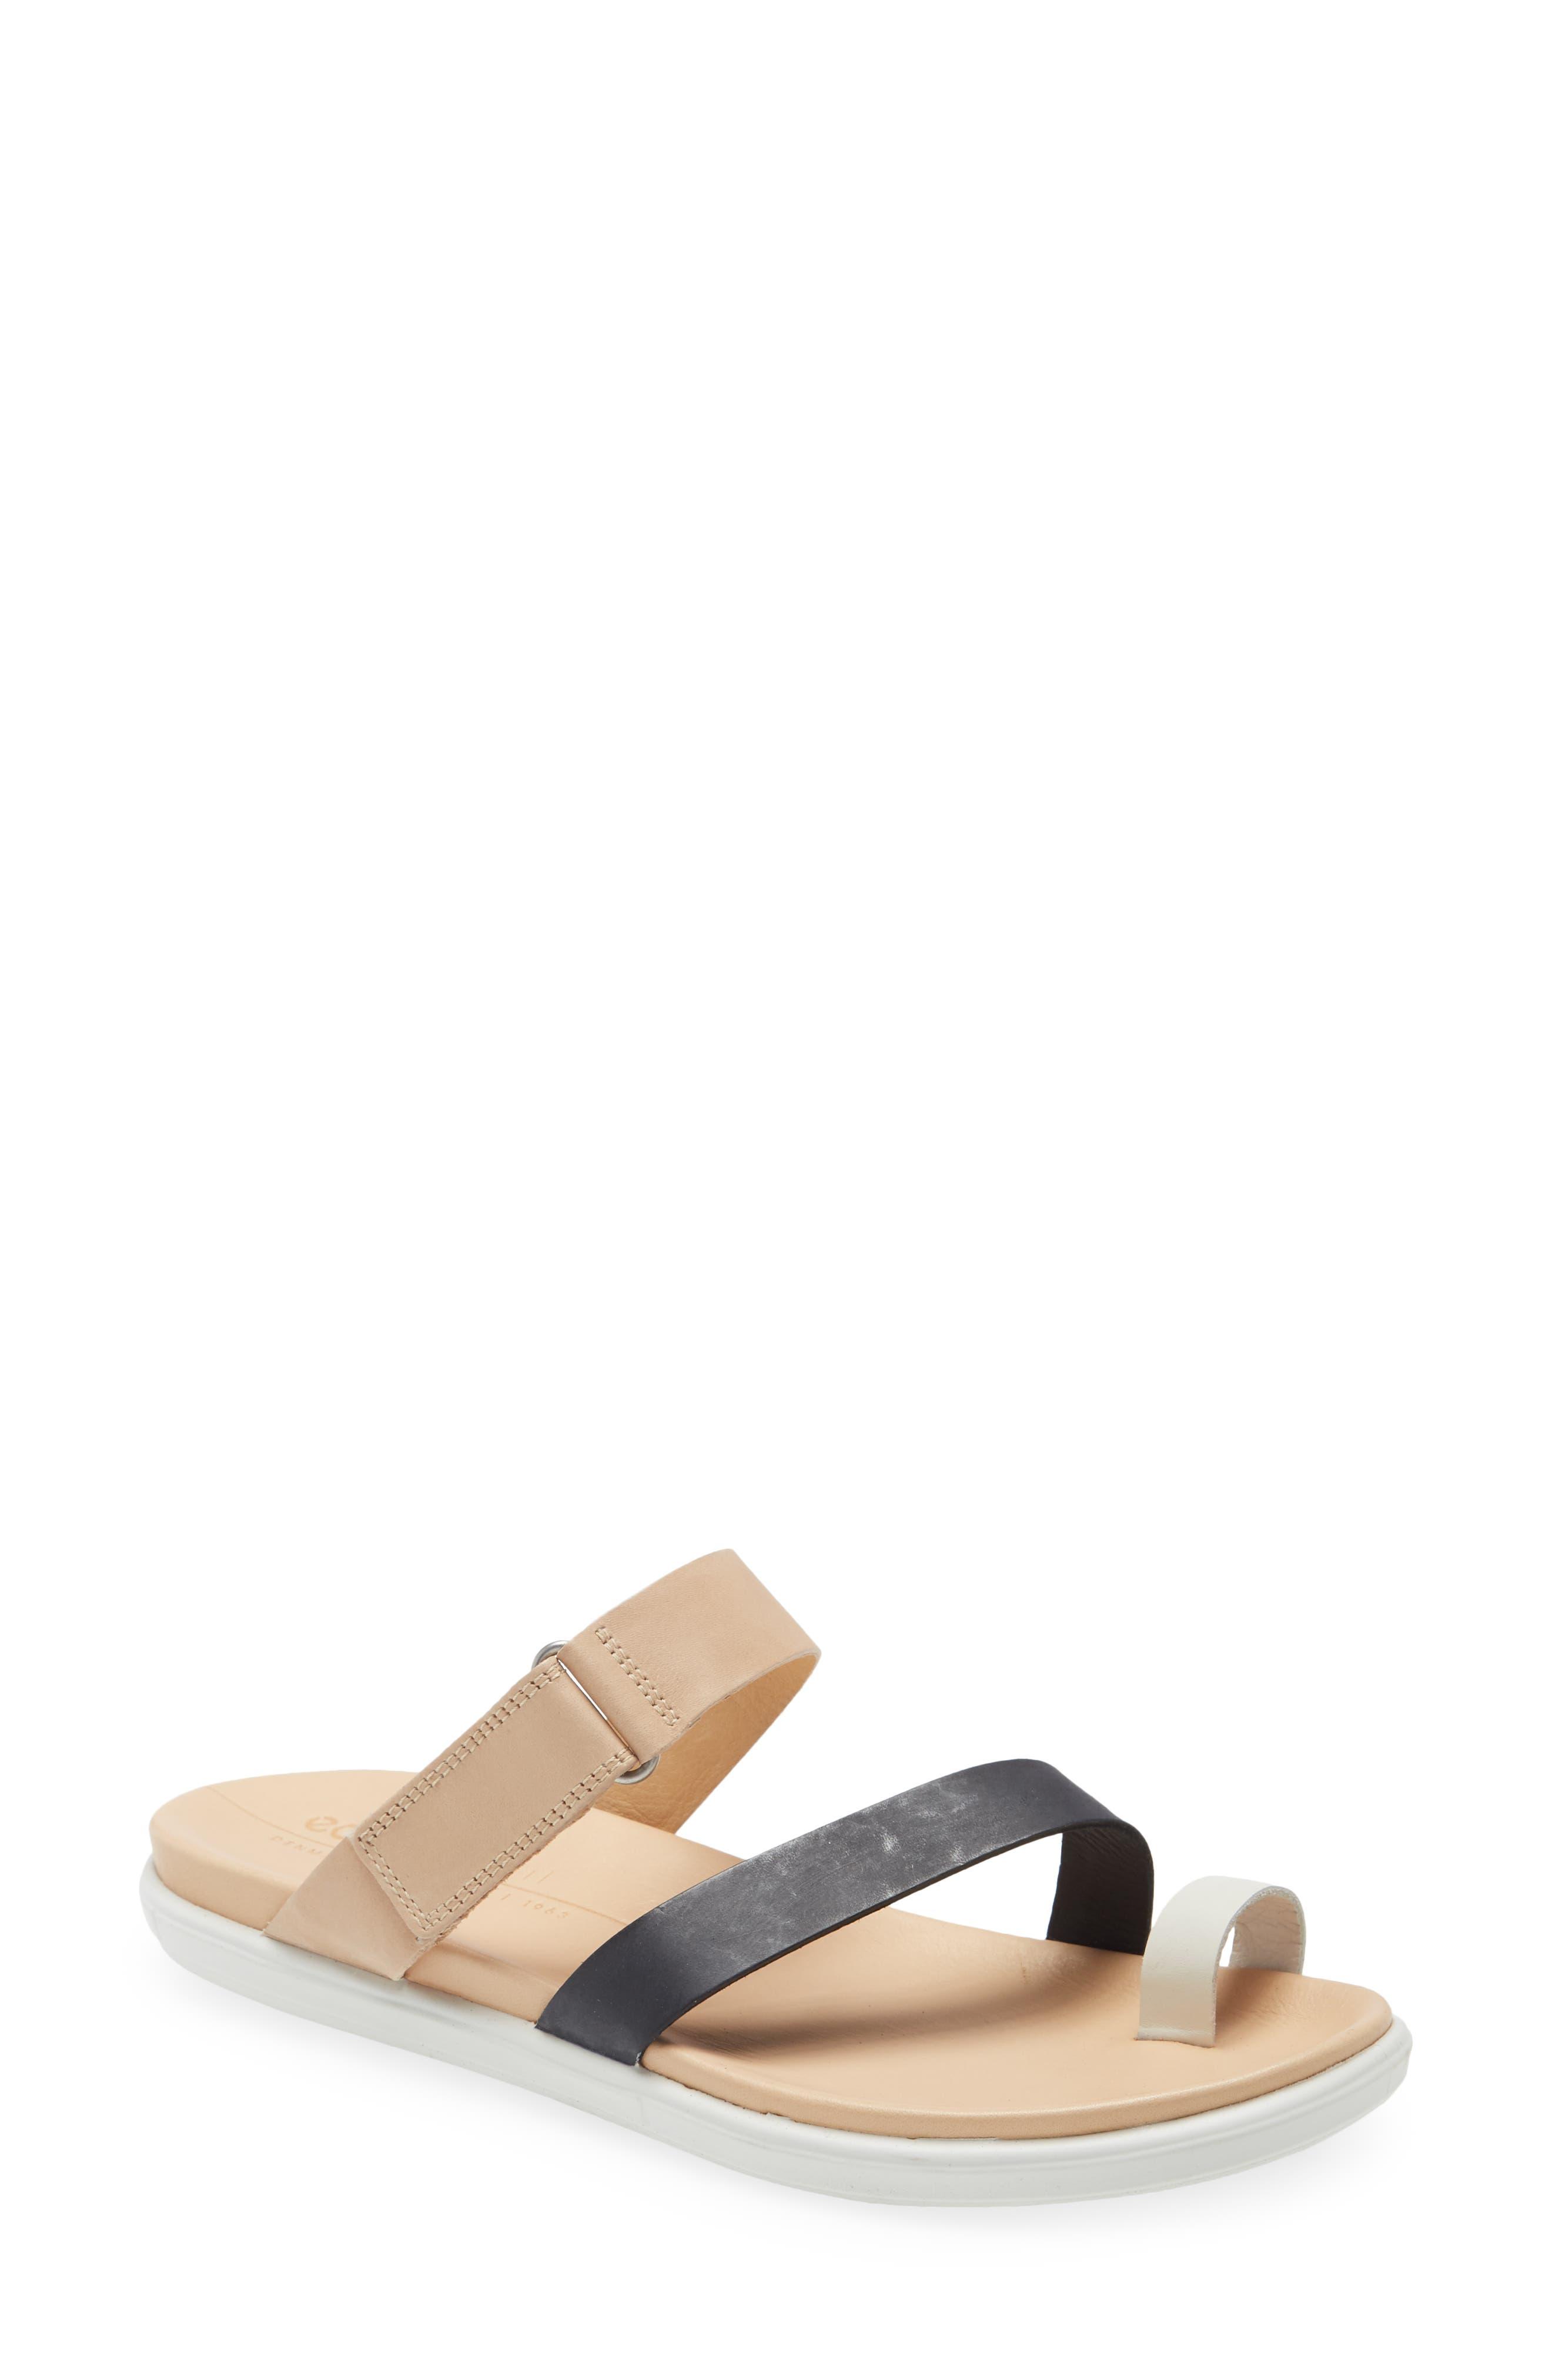 Women's Ecco Simpil Slide Sandal